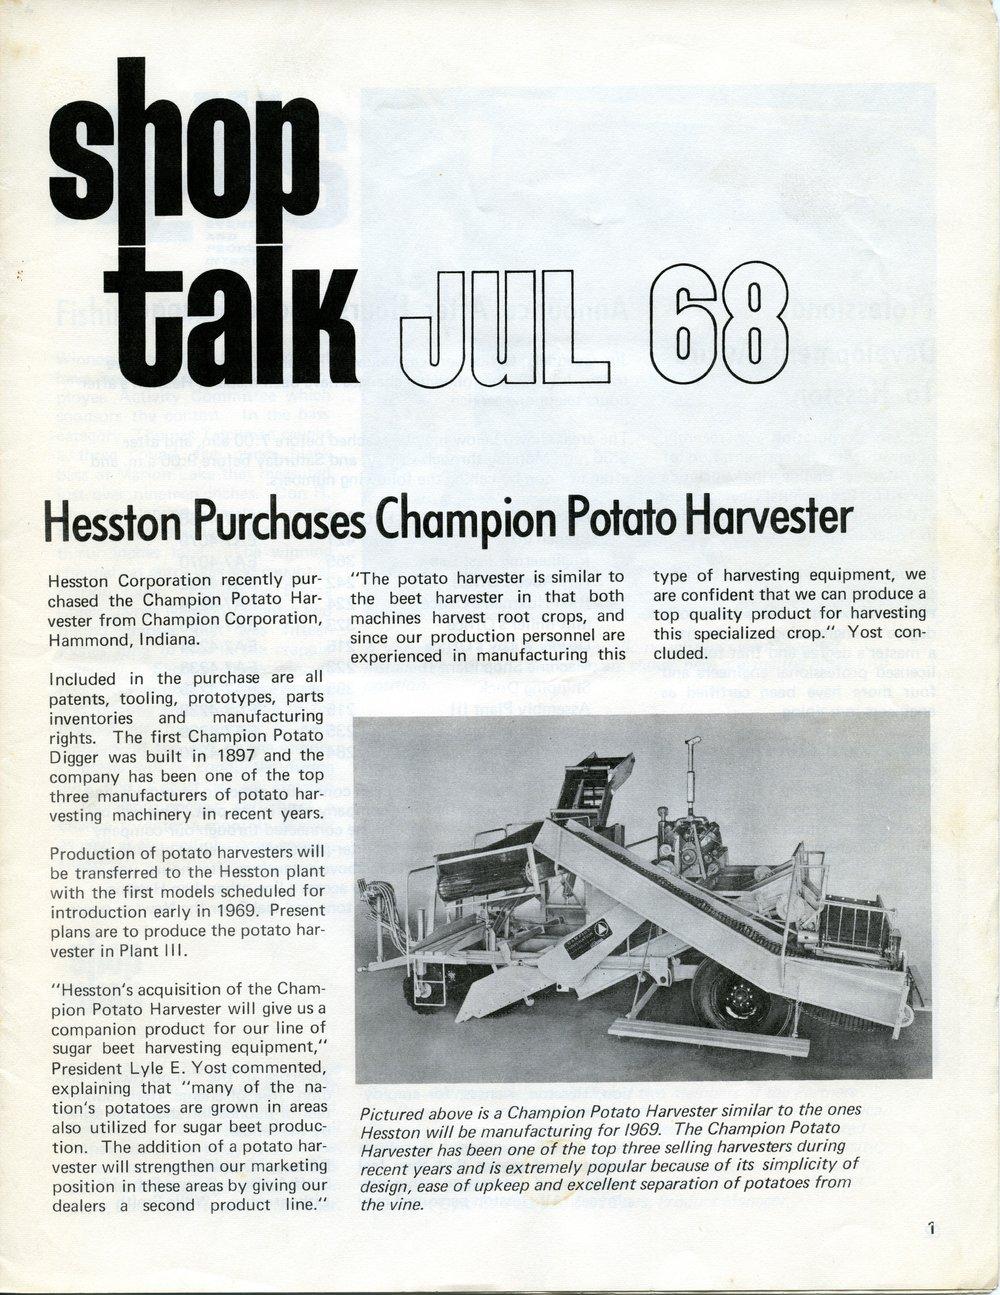 Shop Talk newsletter - Kansas Memory - Kansas Historical Society